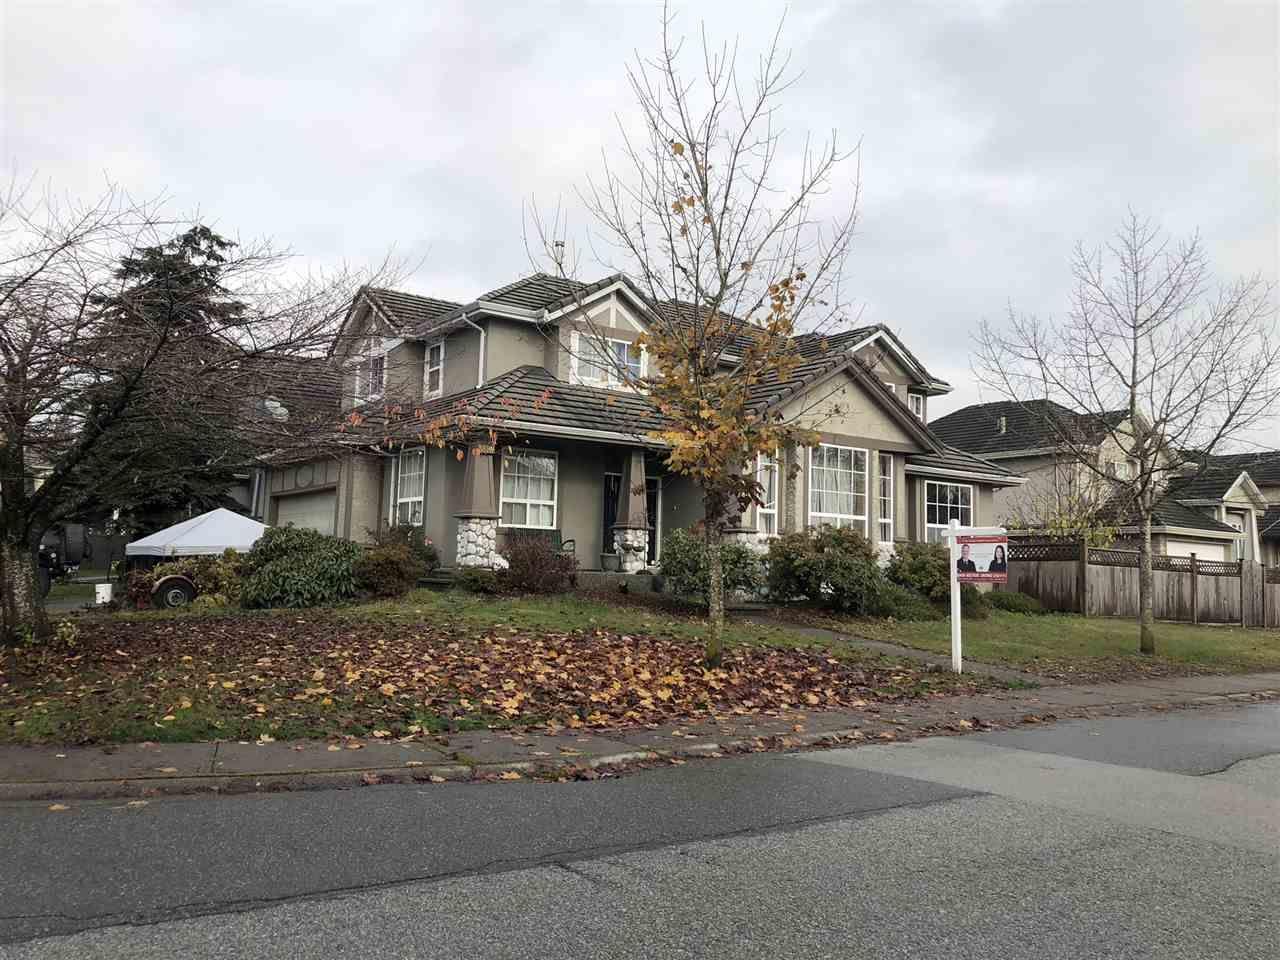 "Main Photo: 15807 111 Avenue in Surrey: Fraser Heights House for sale in ""FRASER HEIGHTS"" (North Surrey)  : MLS®# R2322664"